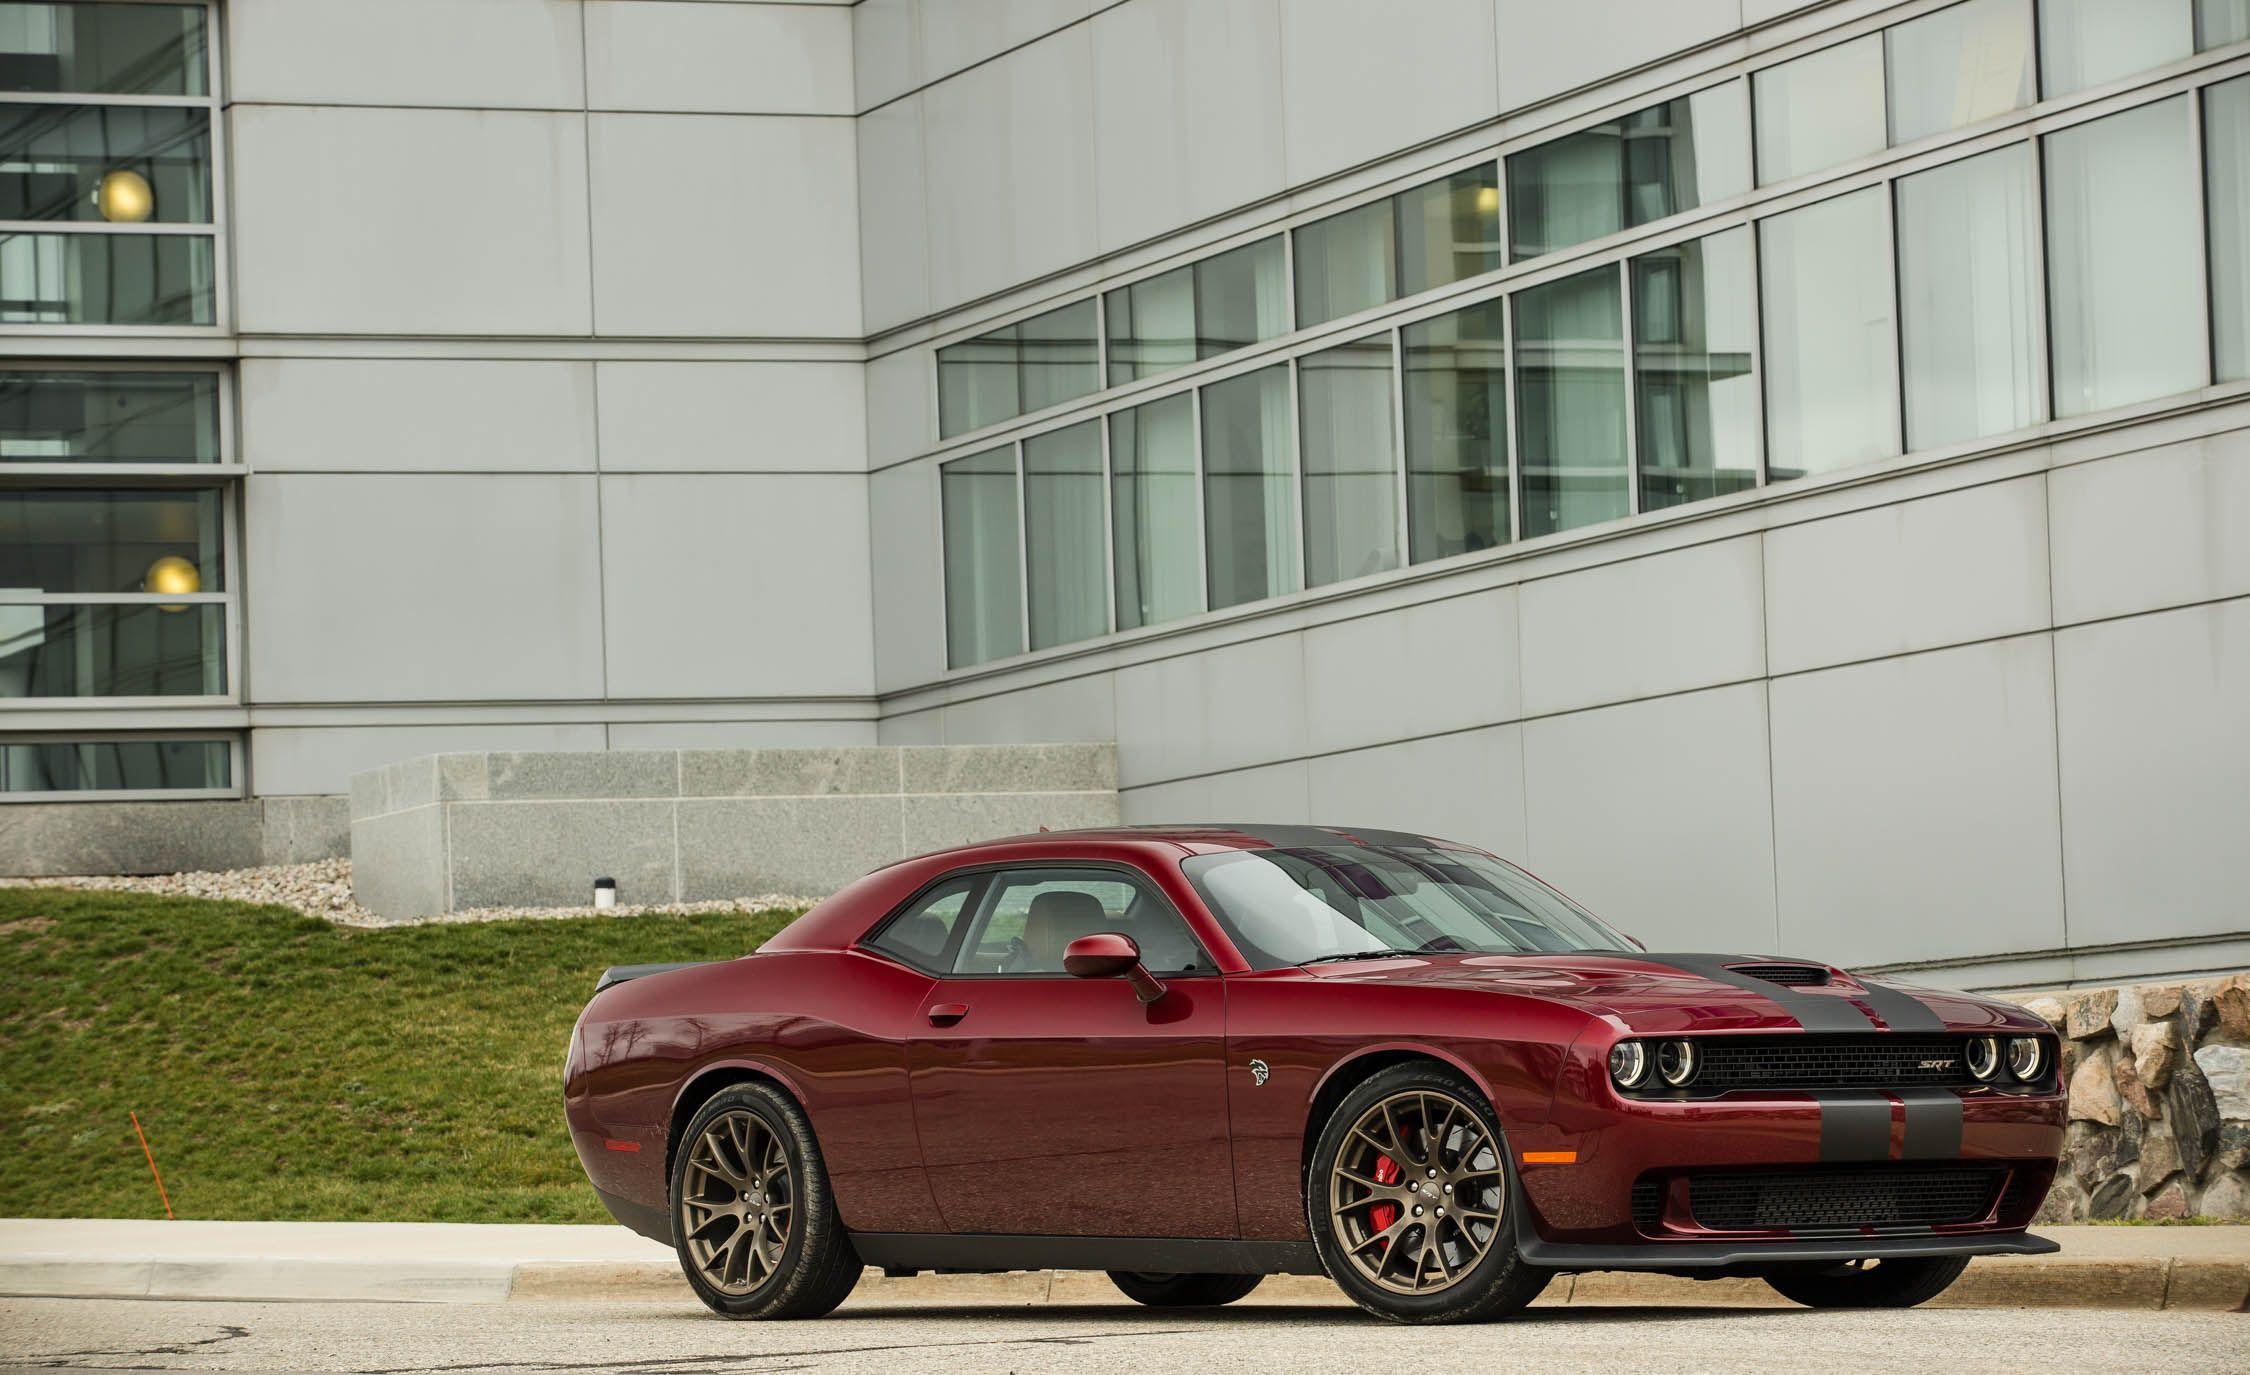 2017 Dodge Challenger SRT 392 SRT Hellcat Interior Review